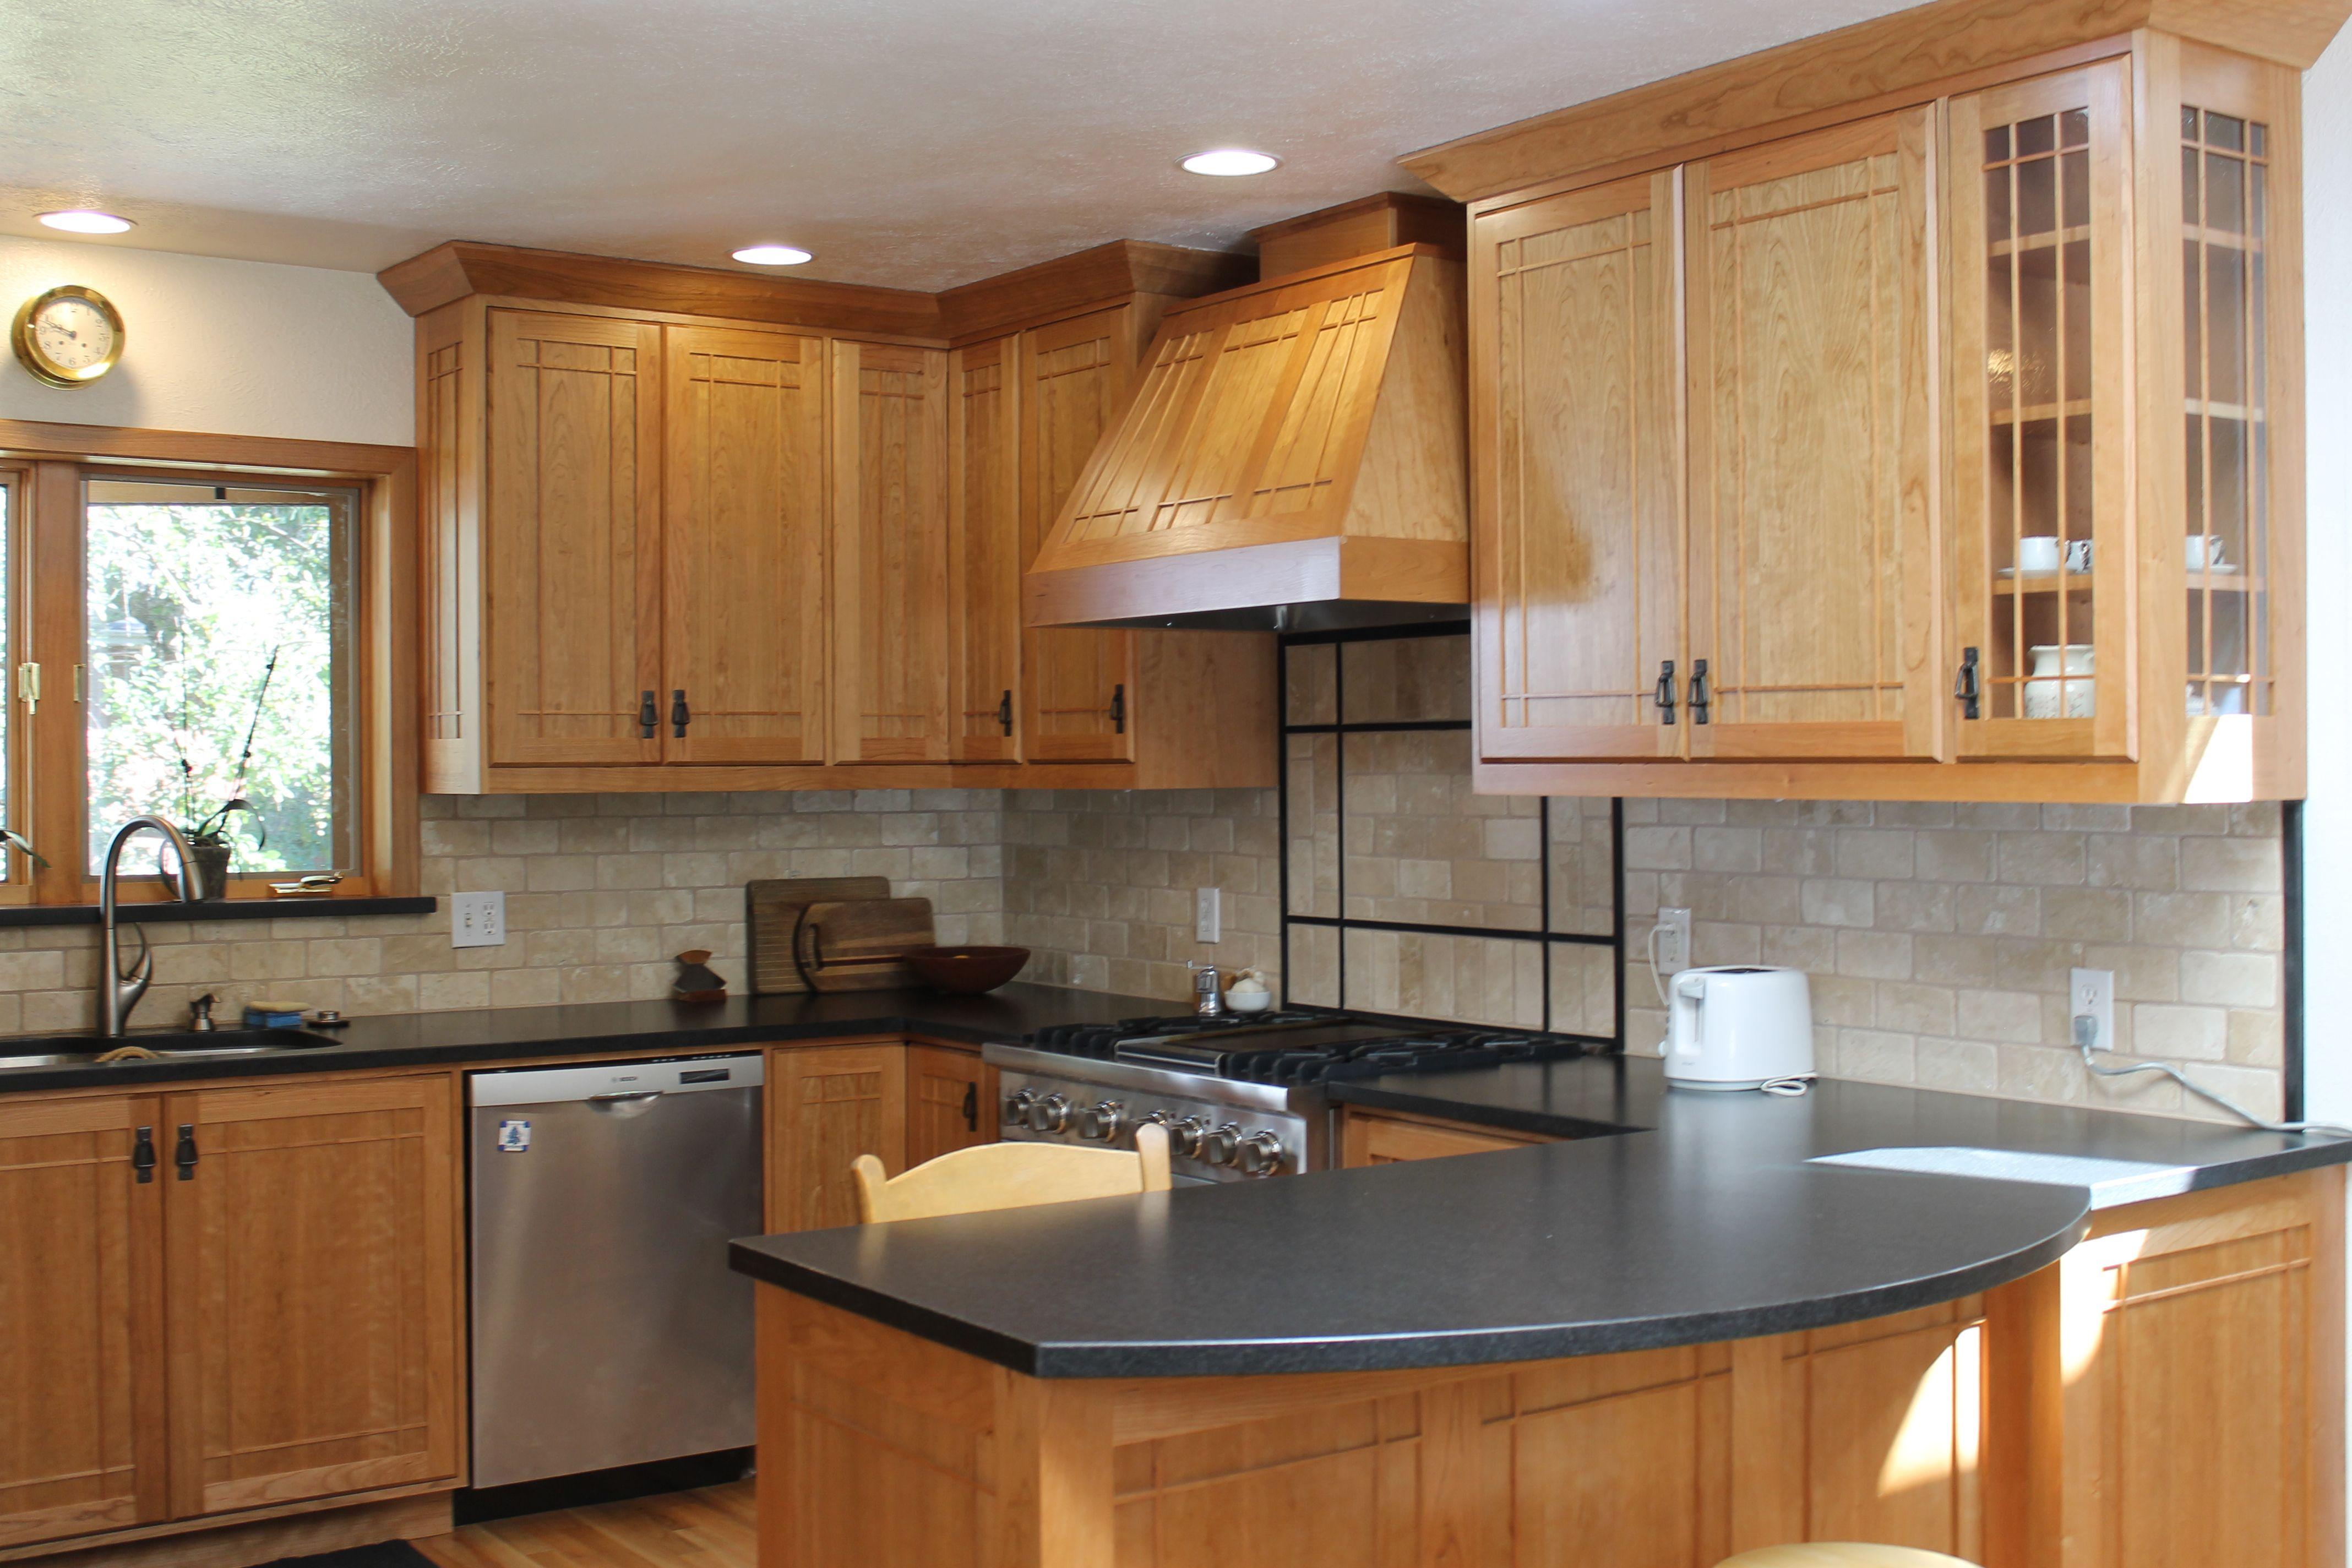 kitchen-contemporary-maple-cabinets-in-black-with-white ... on Maple Kitchen Cabinets With Black Countertops  id=39569